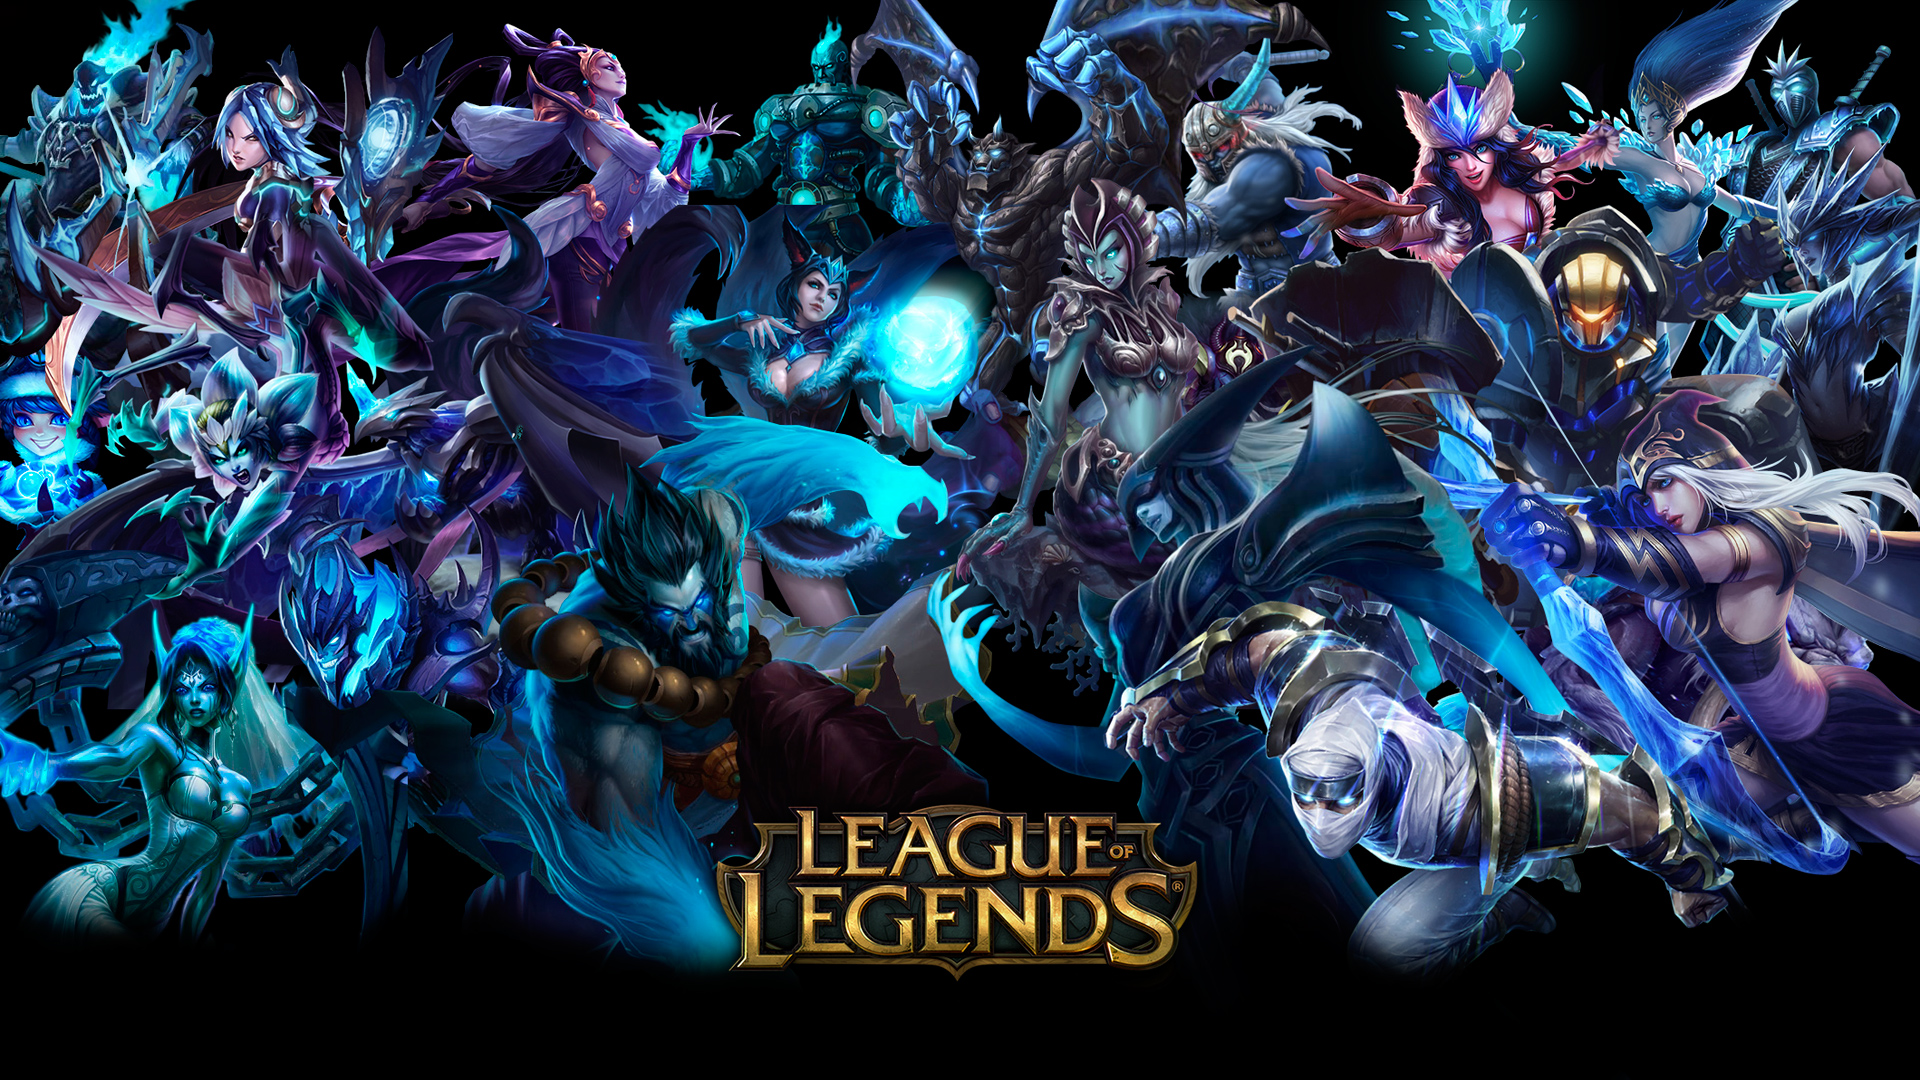 ... shyvana shen league of legends hd wallpaper lol champion 1920x1200 1m